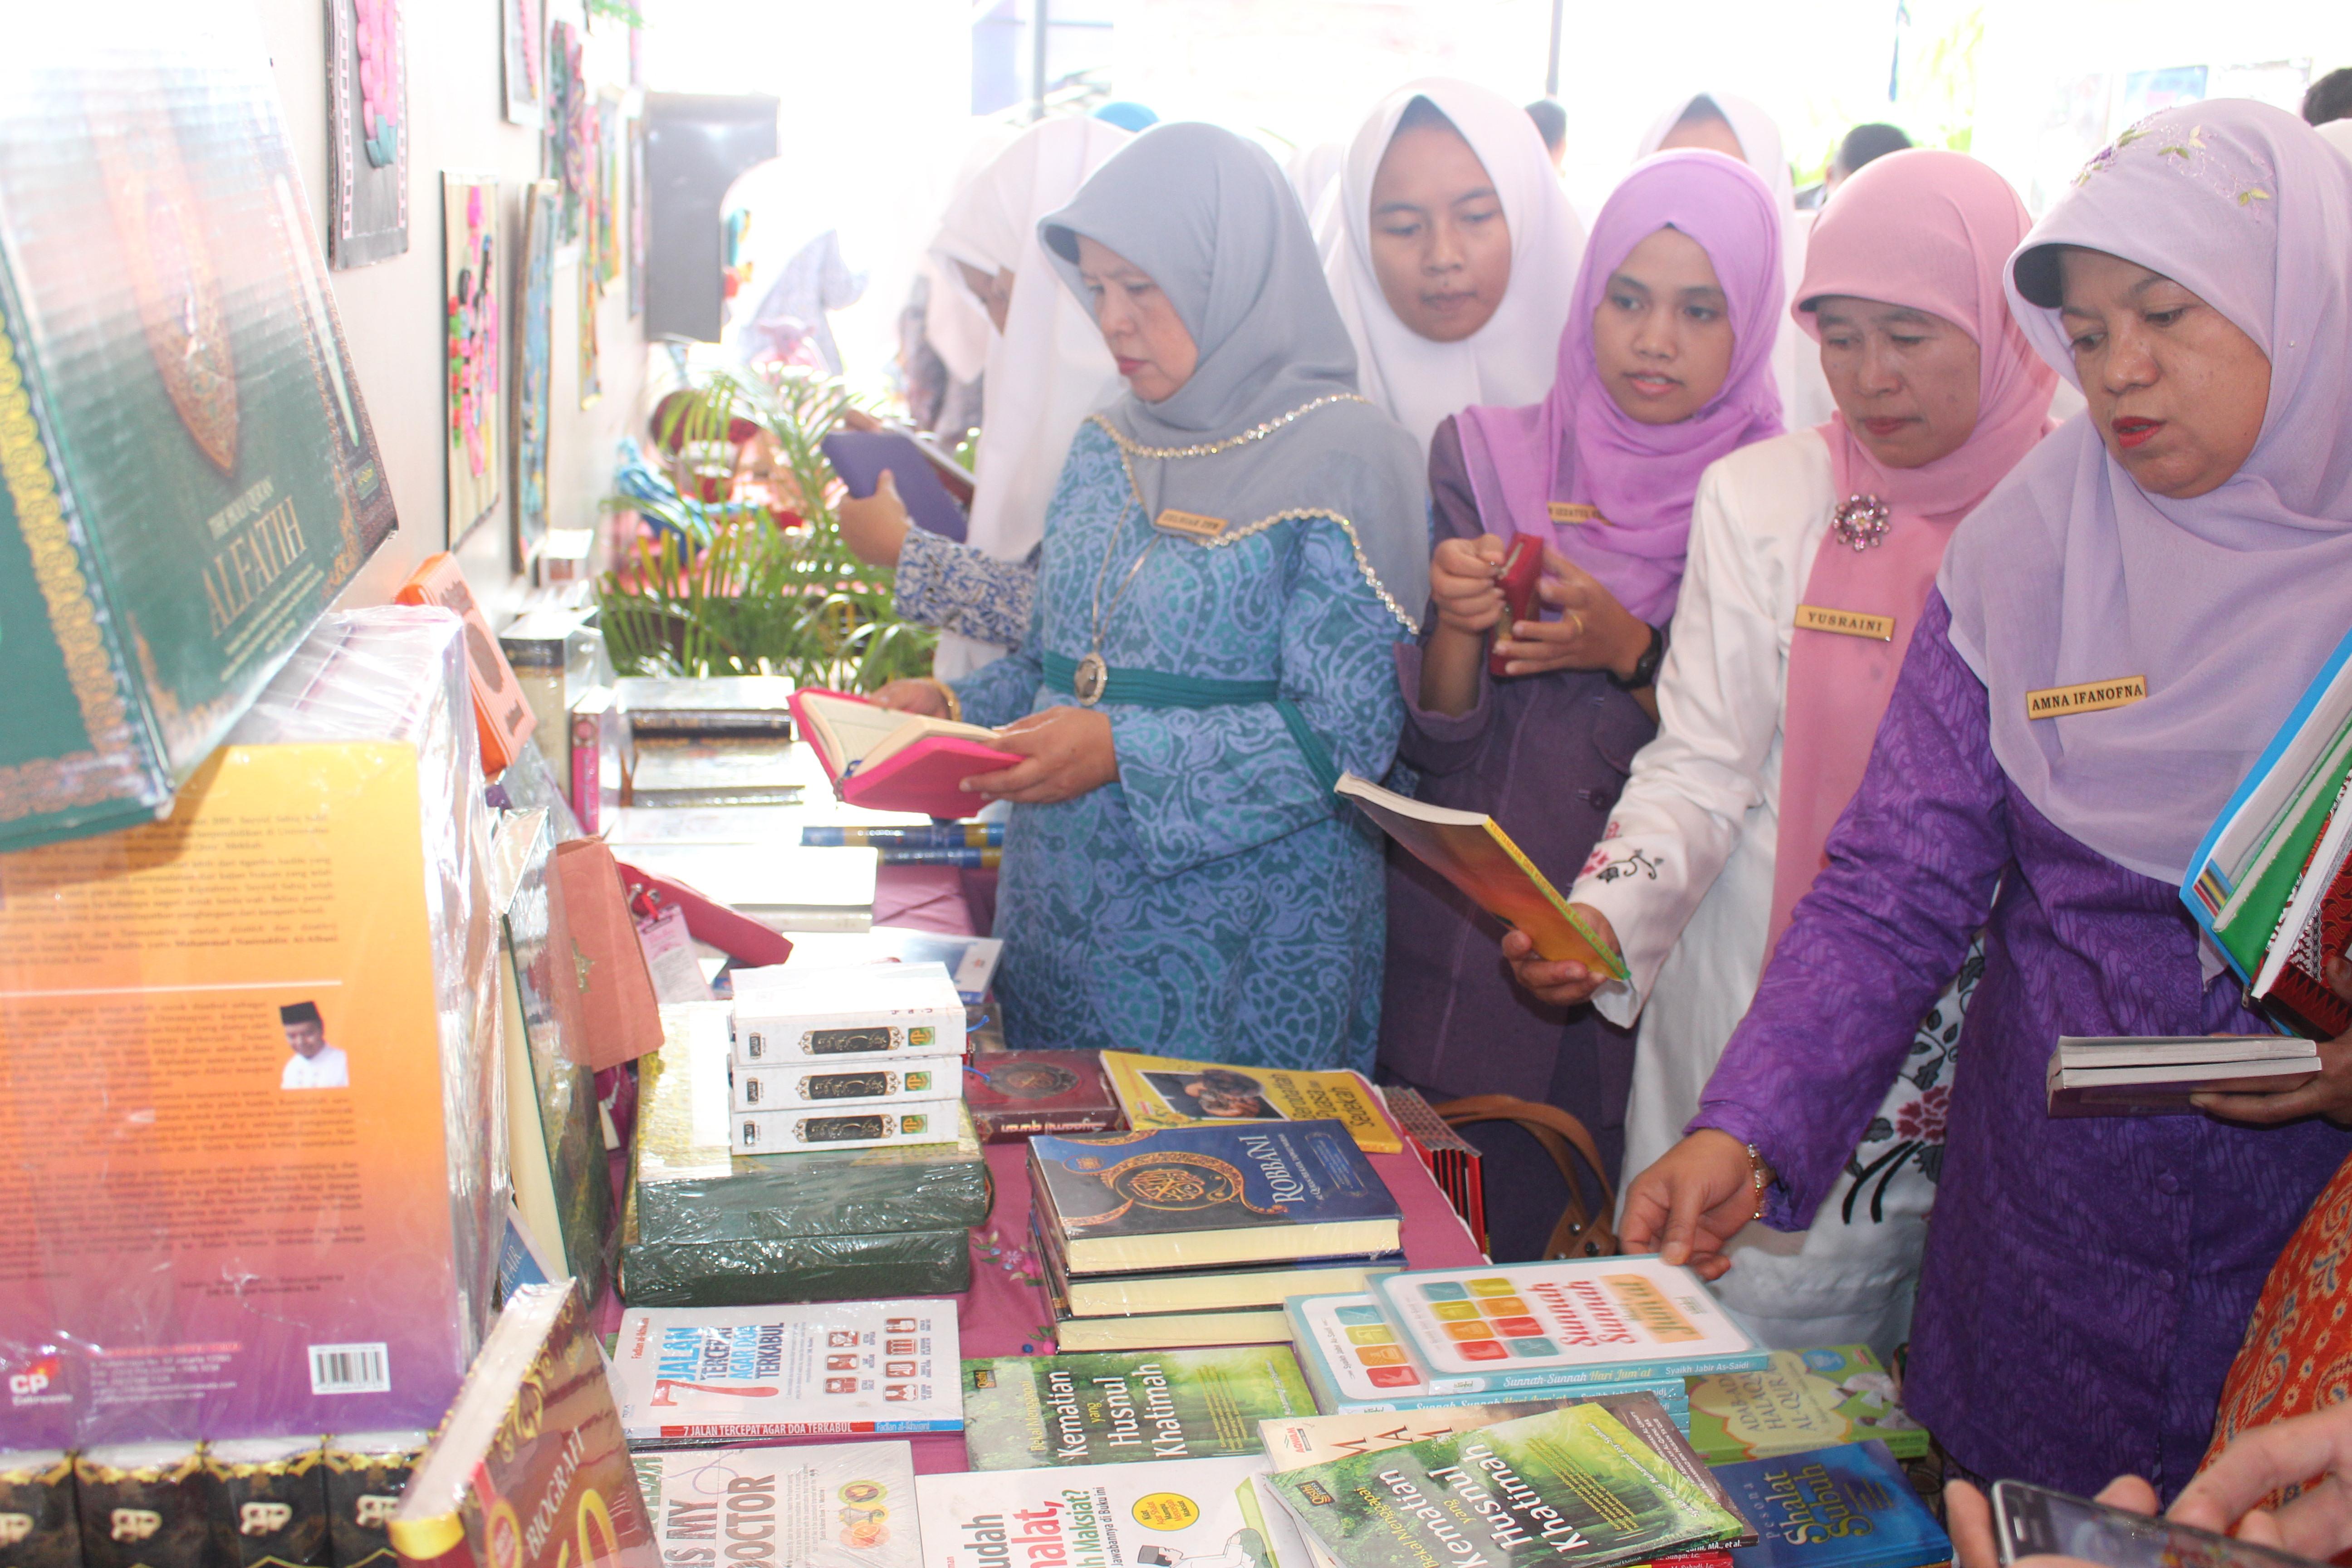 SMAN 1 Ampek Angkek adakan Bazar Buku dan Pameran Seni Kriya